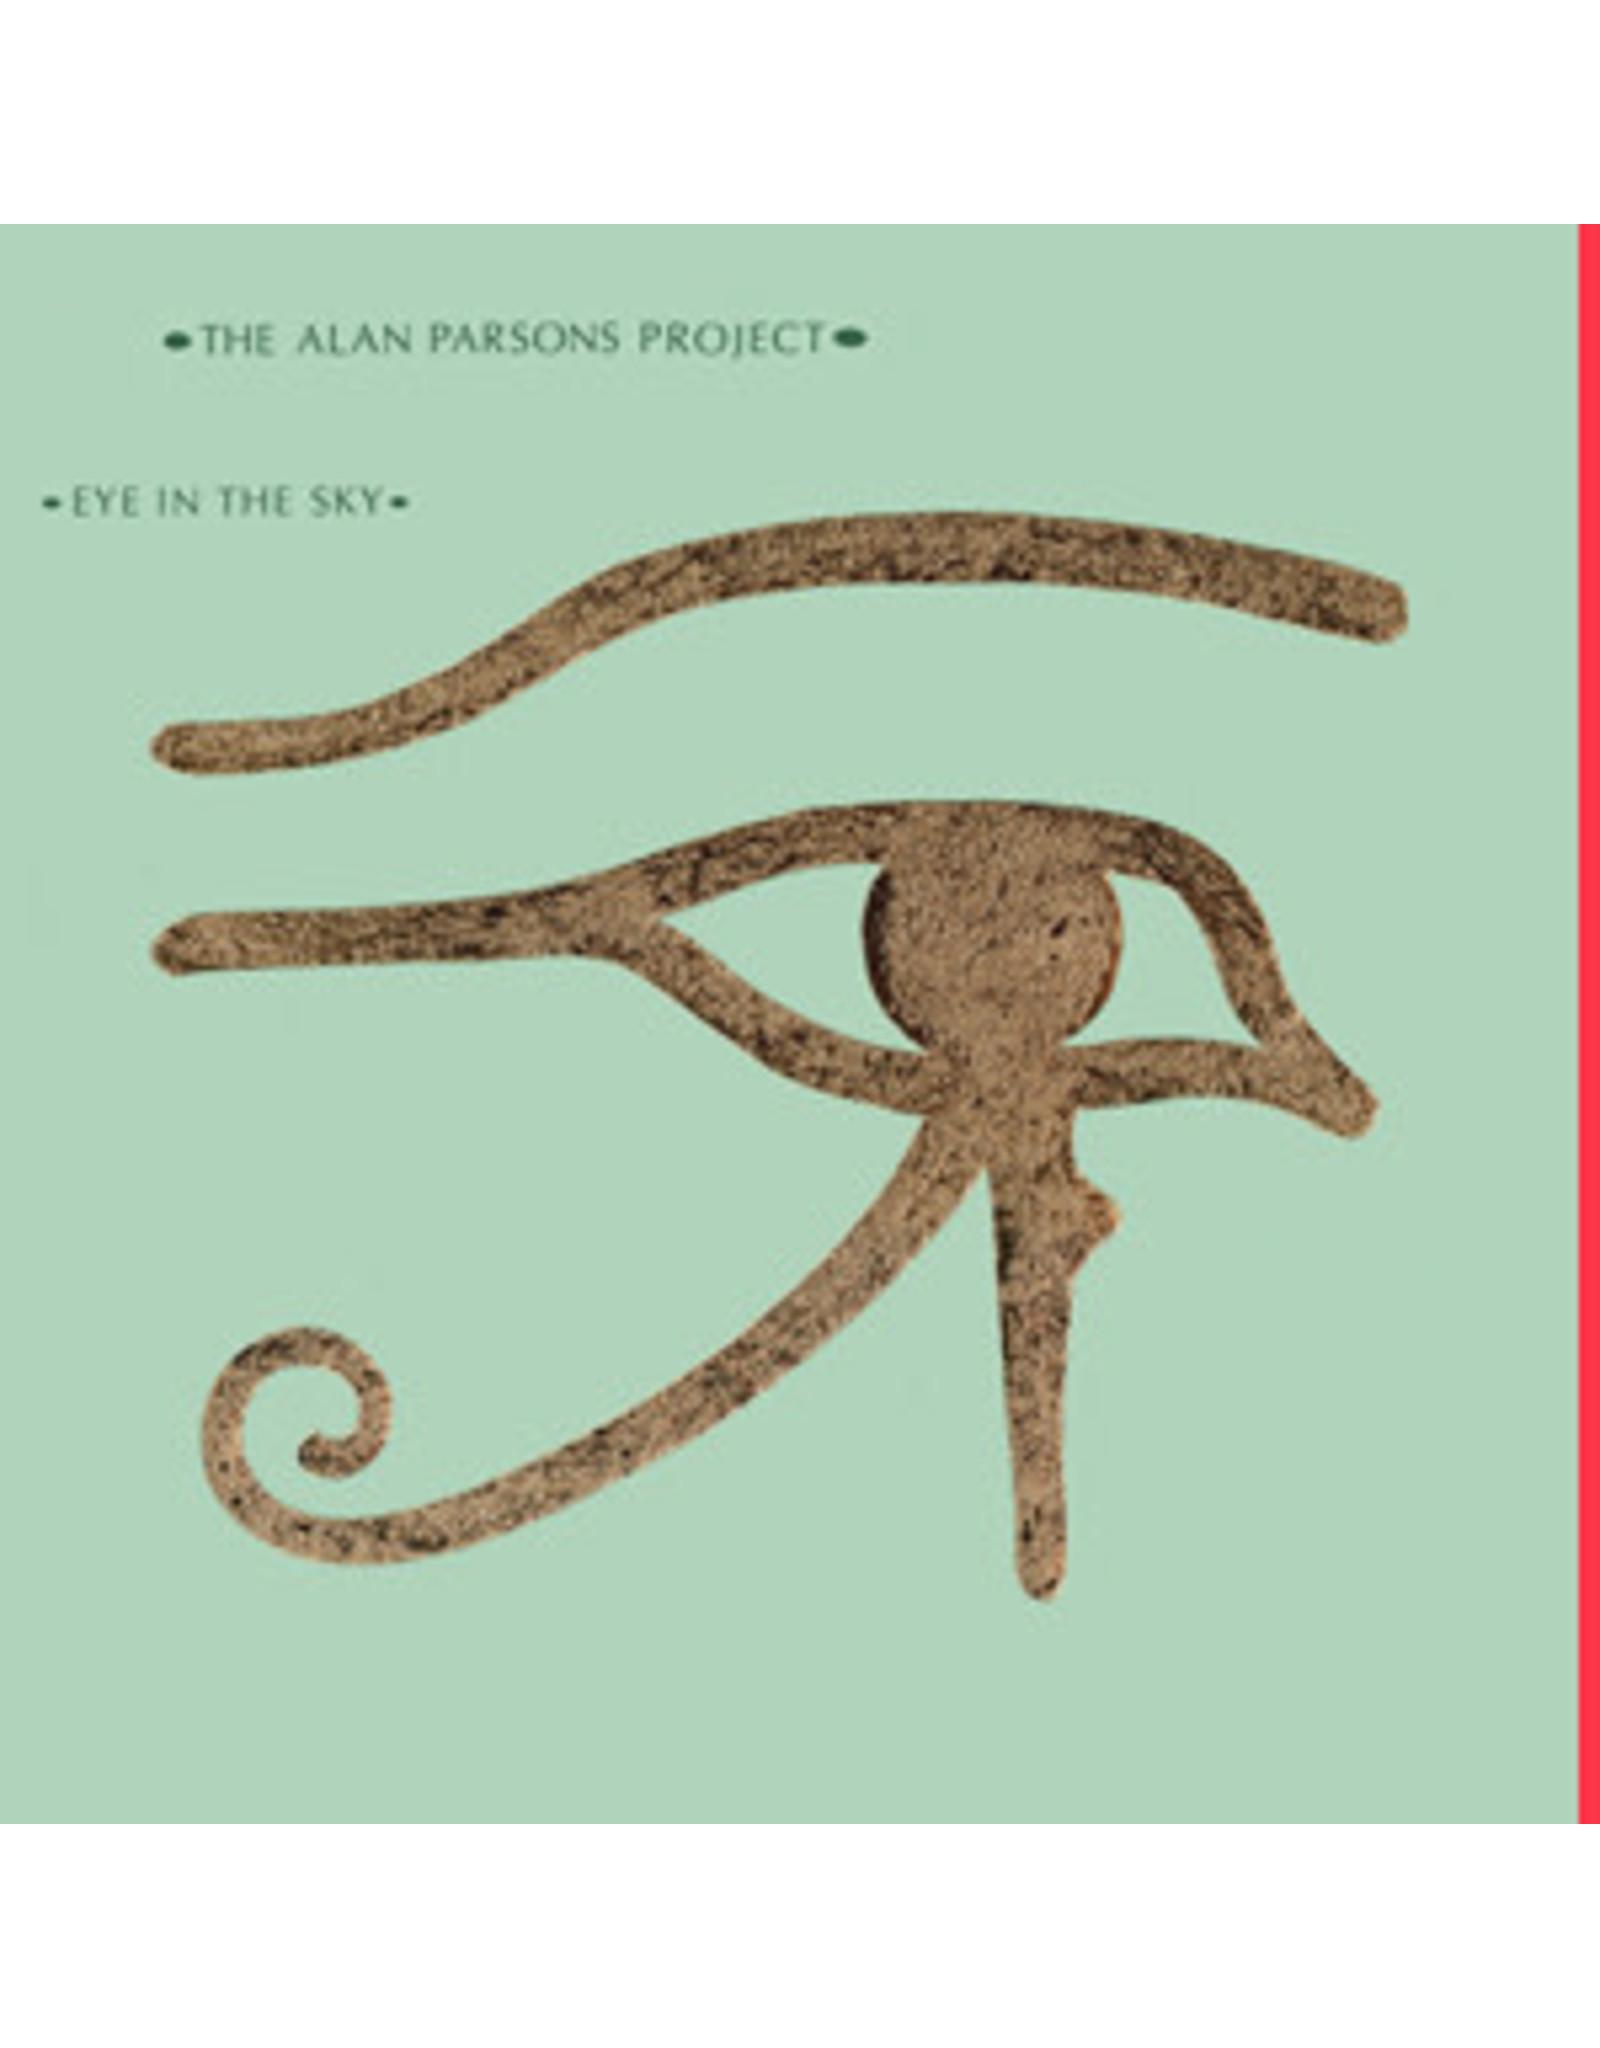 Allan Parsons Project - Eye In The Sky